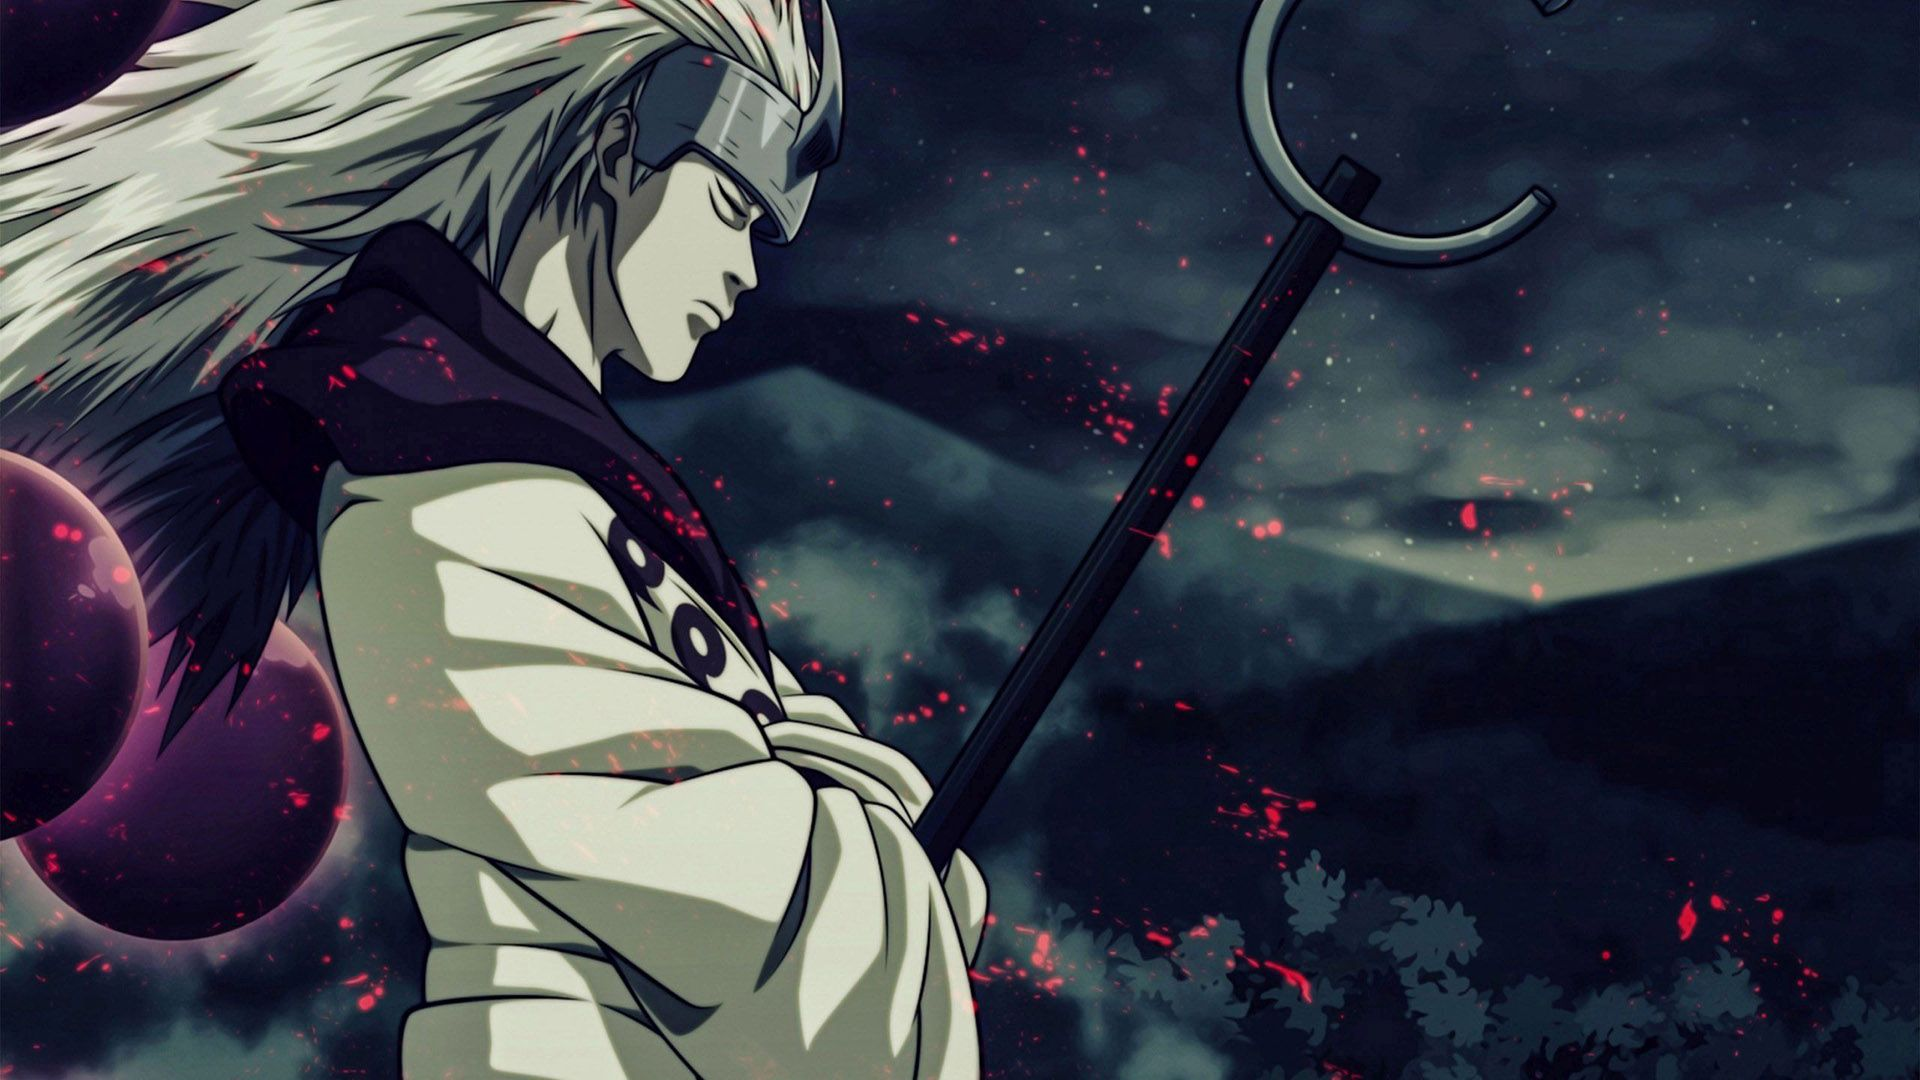 Pics photos wallpaper hd obito uchiha wallpaper hd dark - Image For Naruto Wallpapers Hd For Desktop